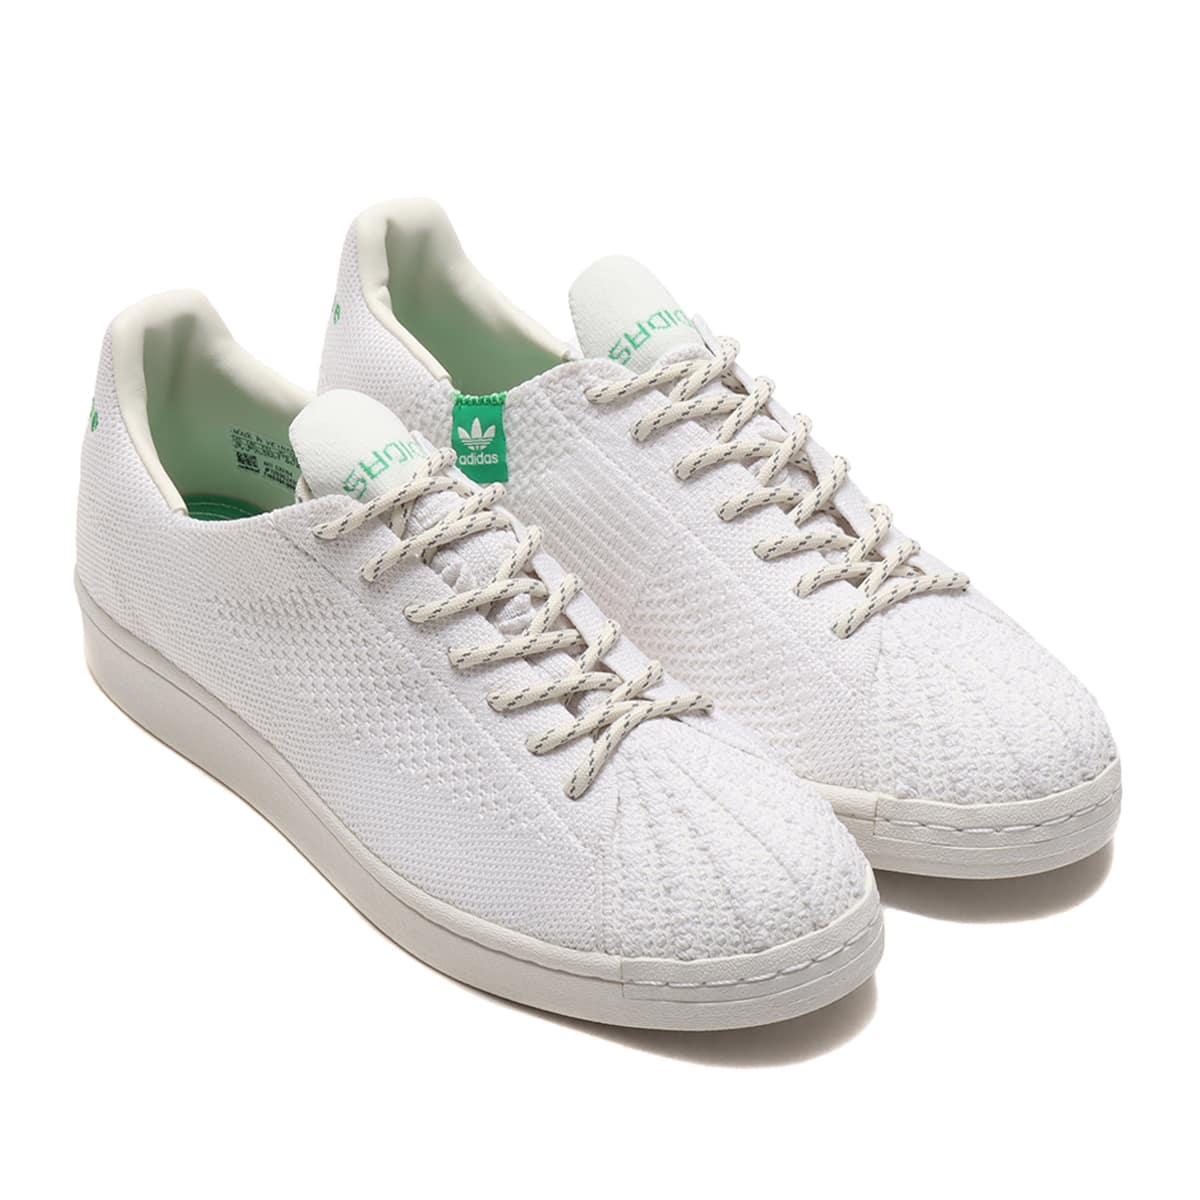 adidas PW SST PK CORE WHITE/CORE WHITE/VIVID GREEN 21SS-S_photo_large